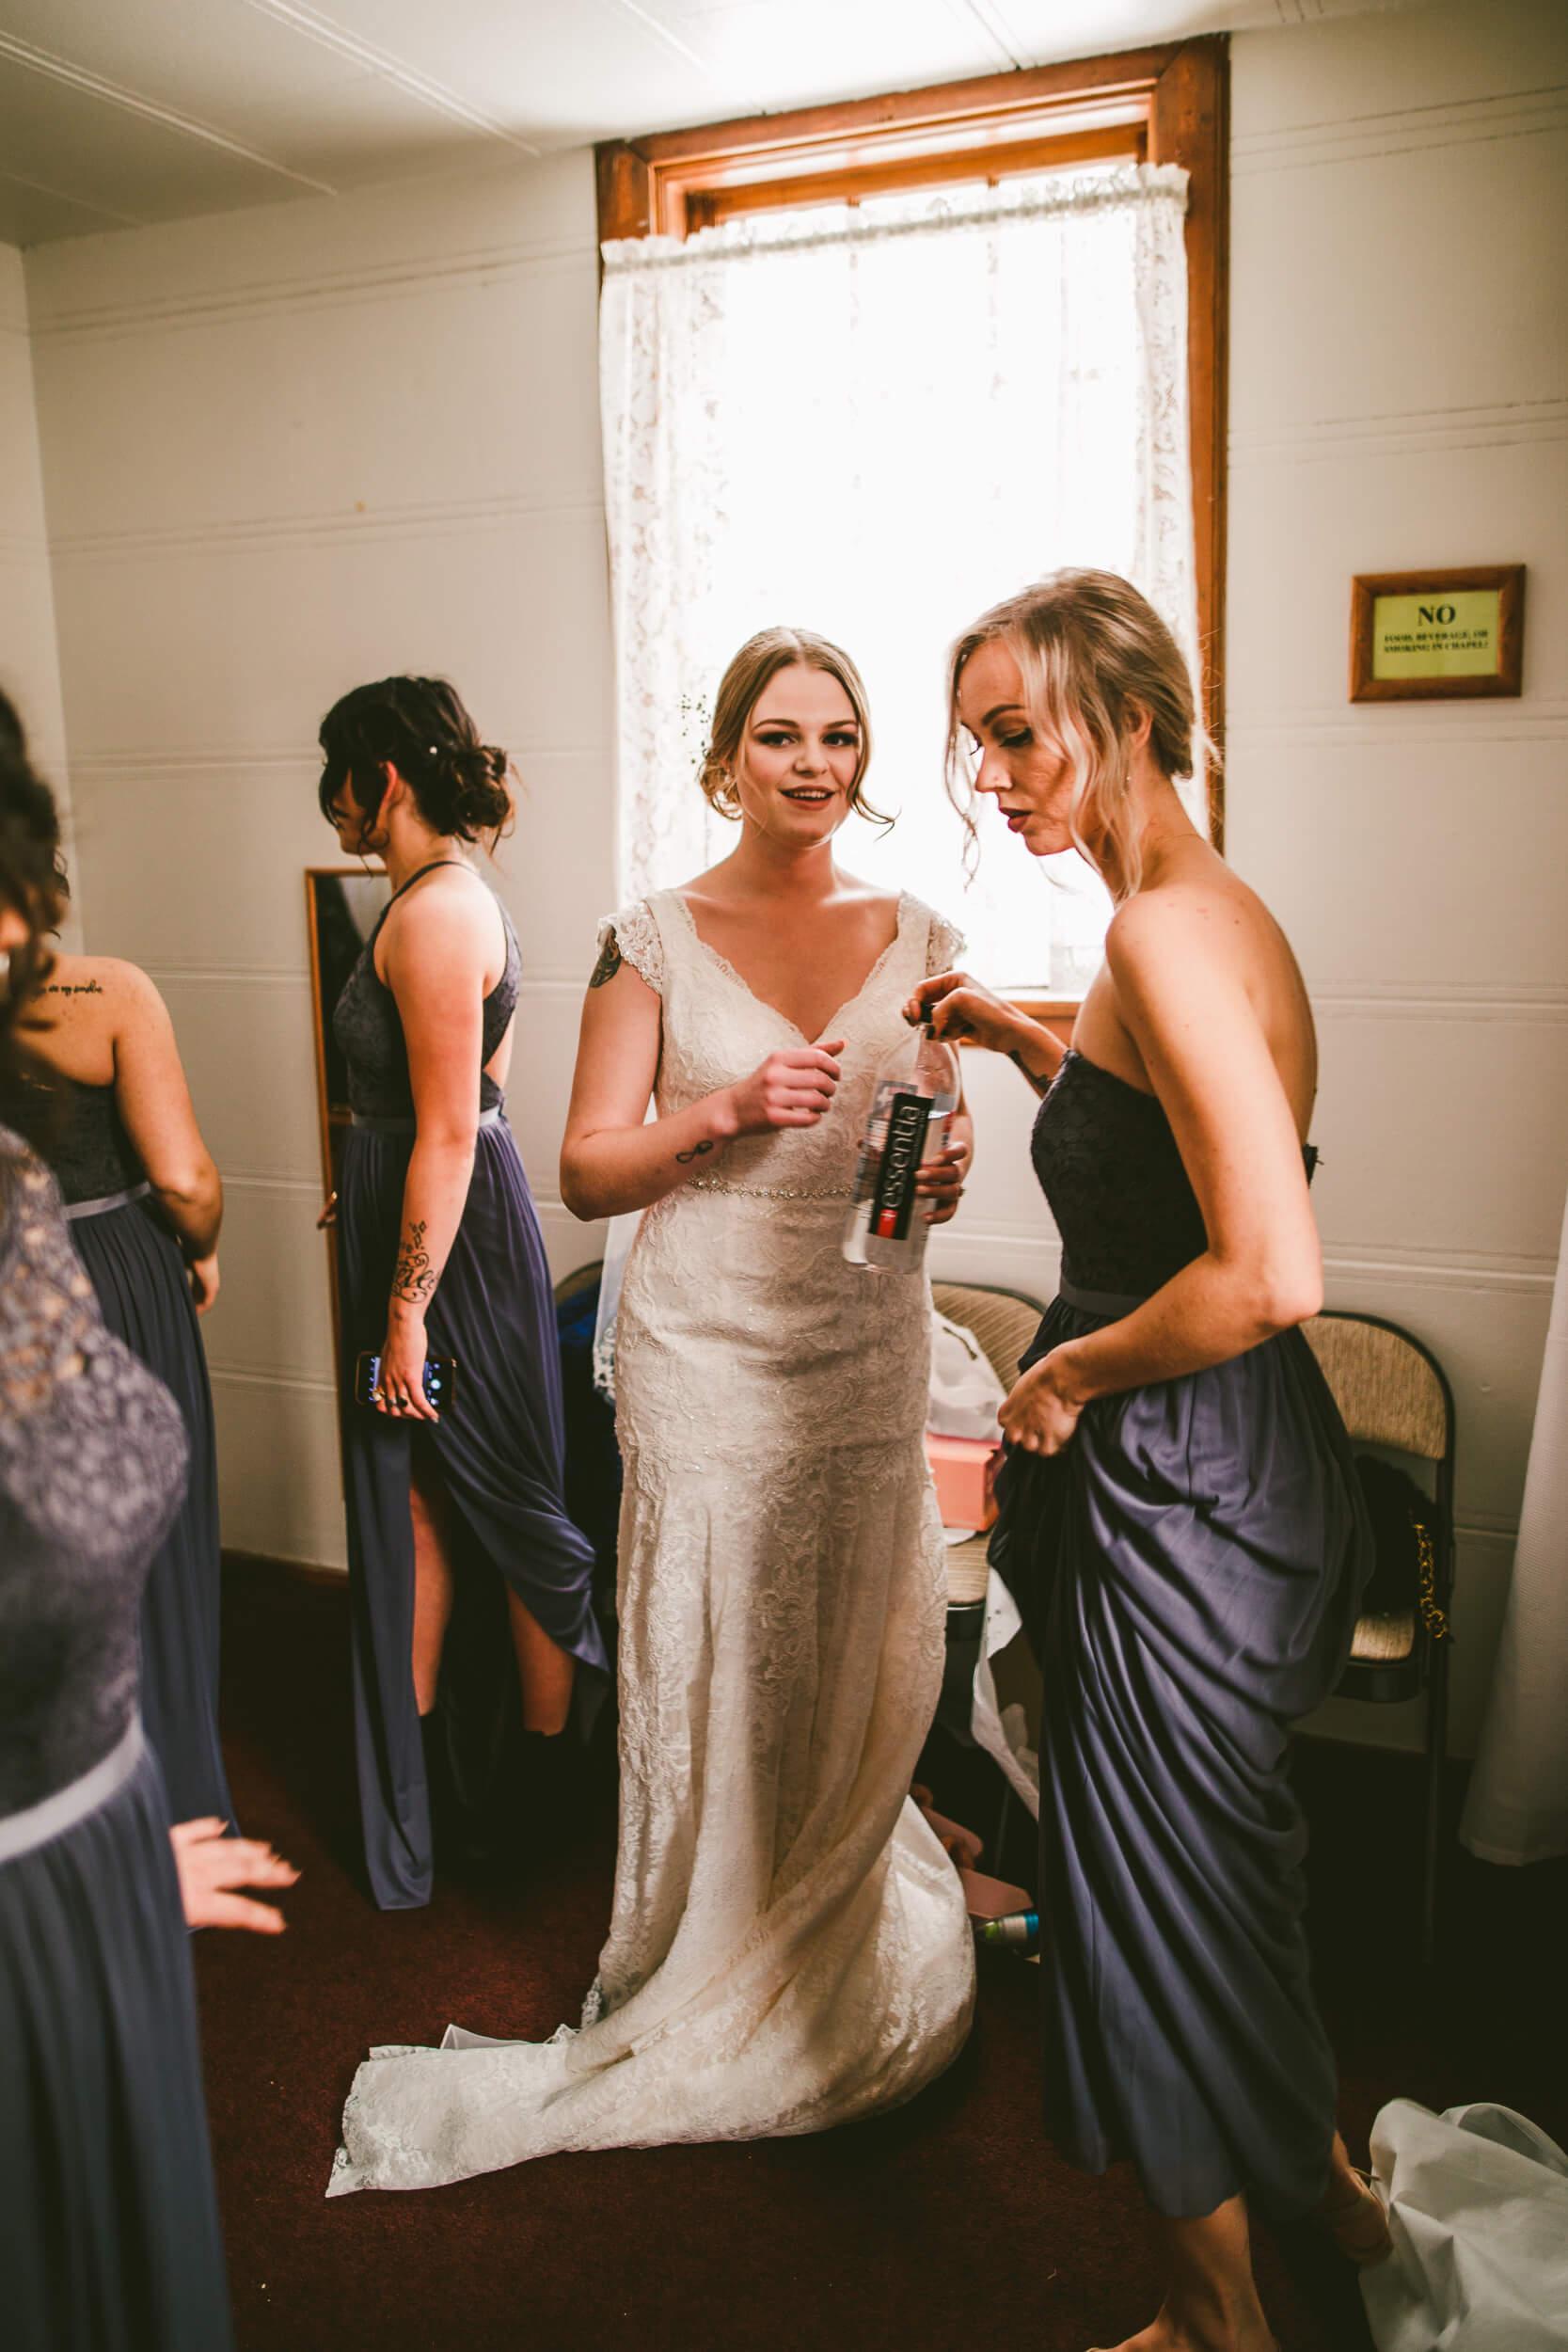 mukogawa winter wedding in spokane (35).jpg